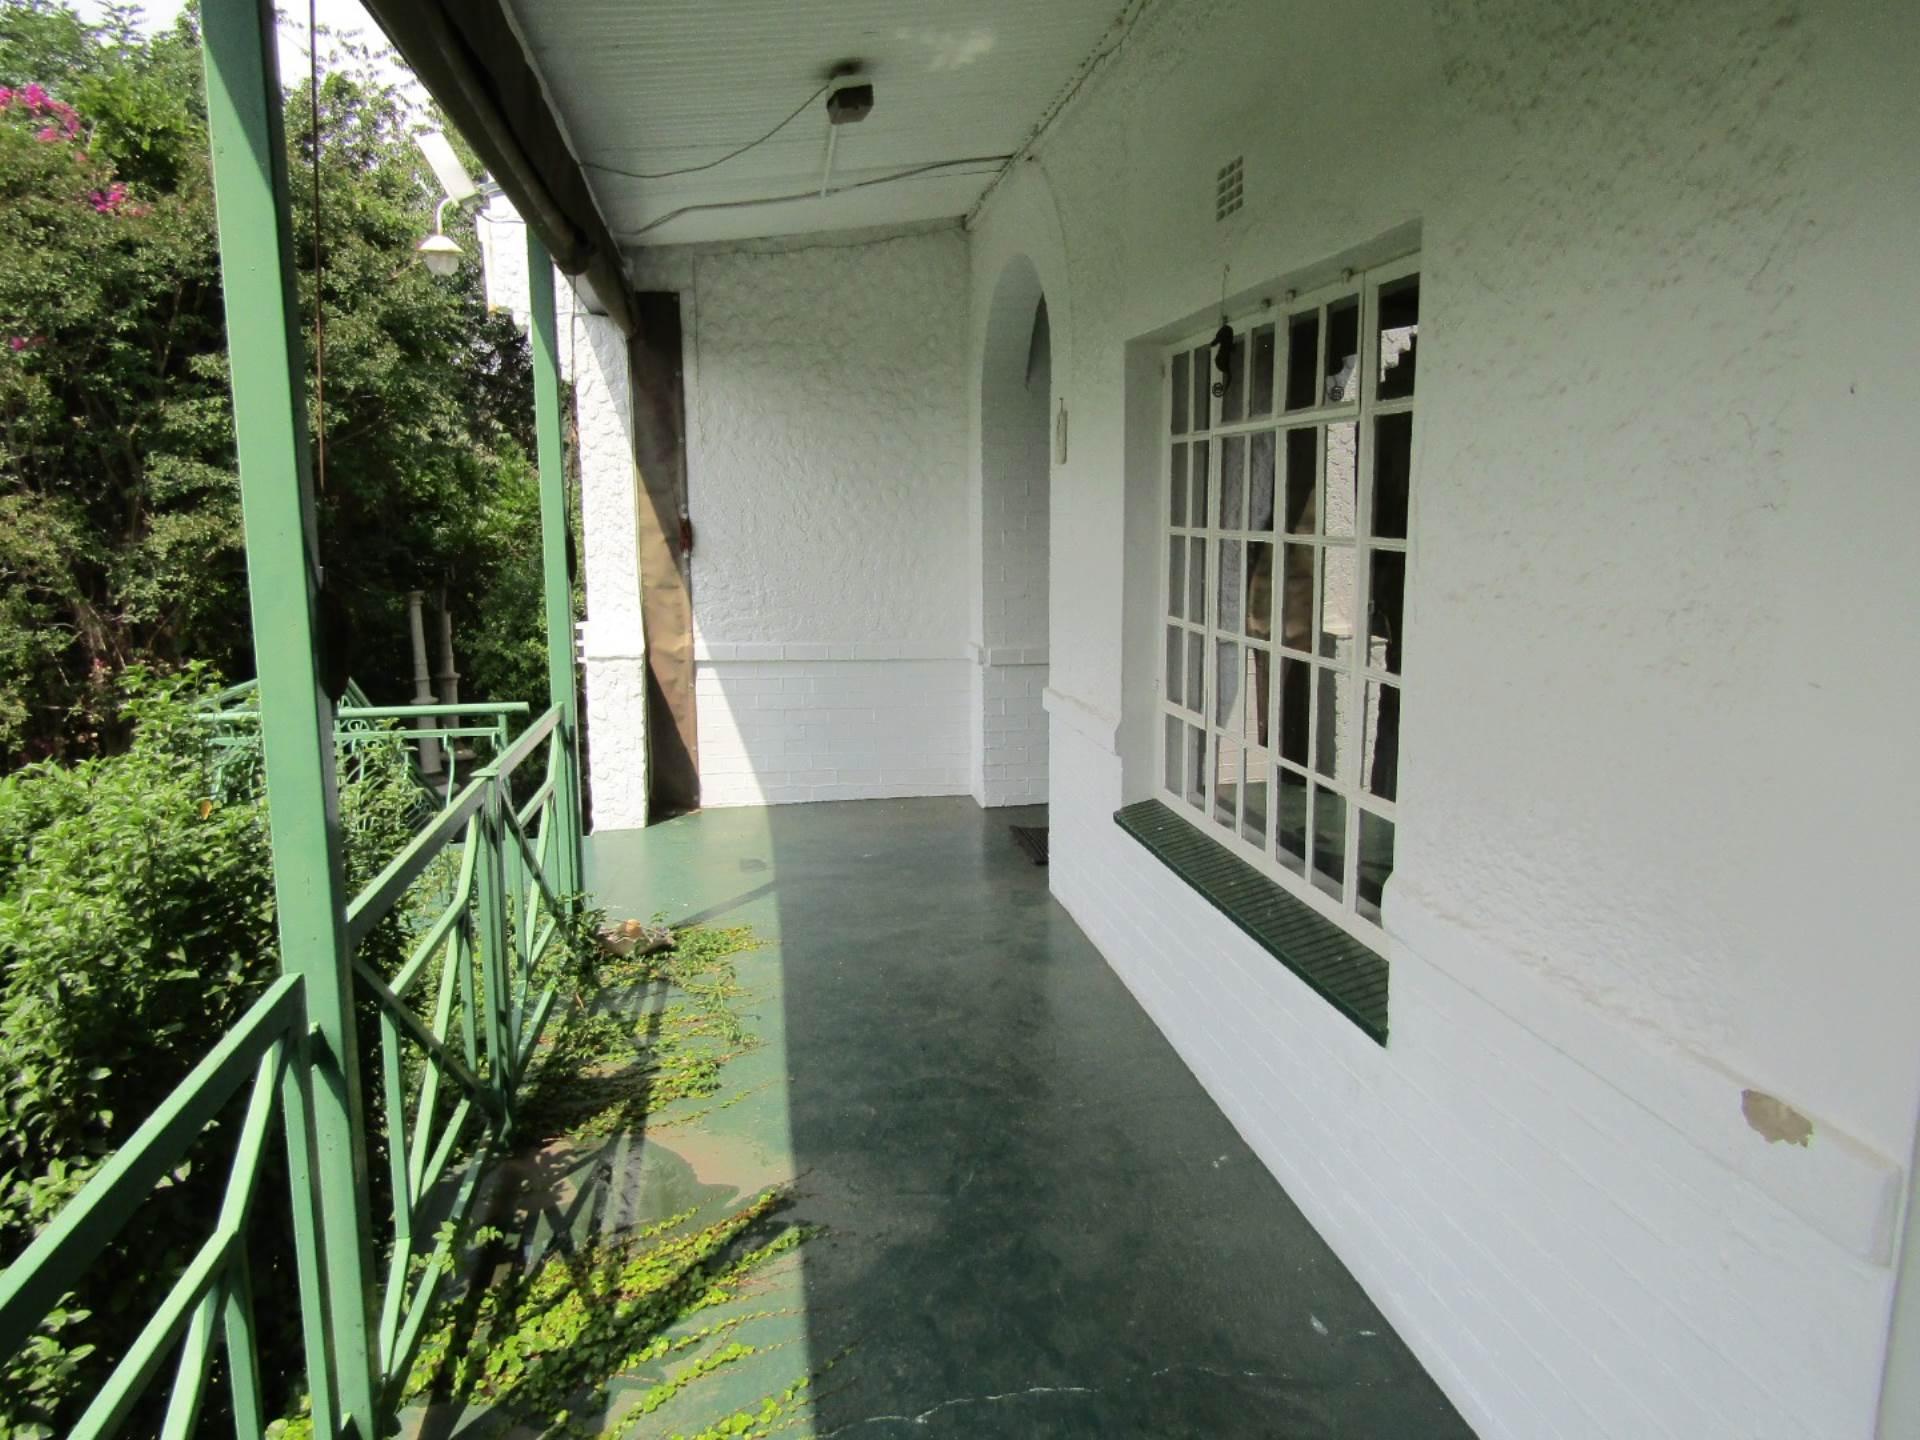 3 BedroomHouse For Sale In Kensington